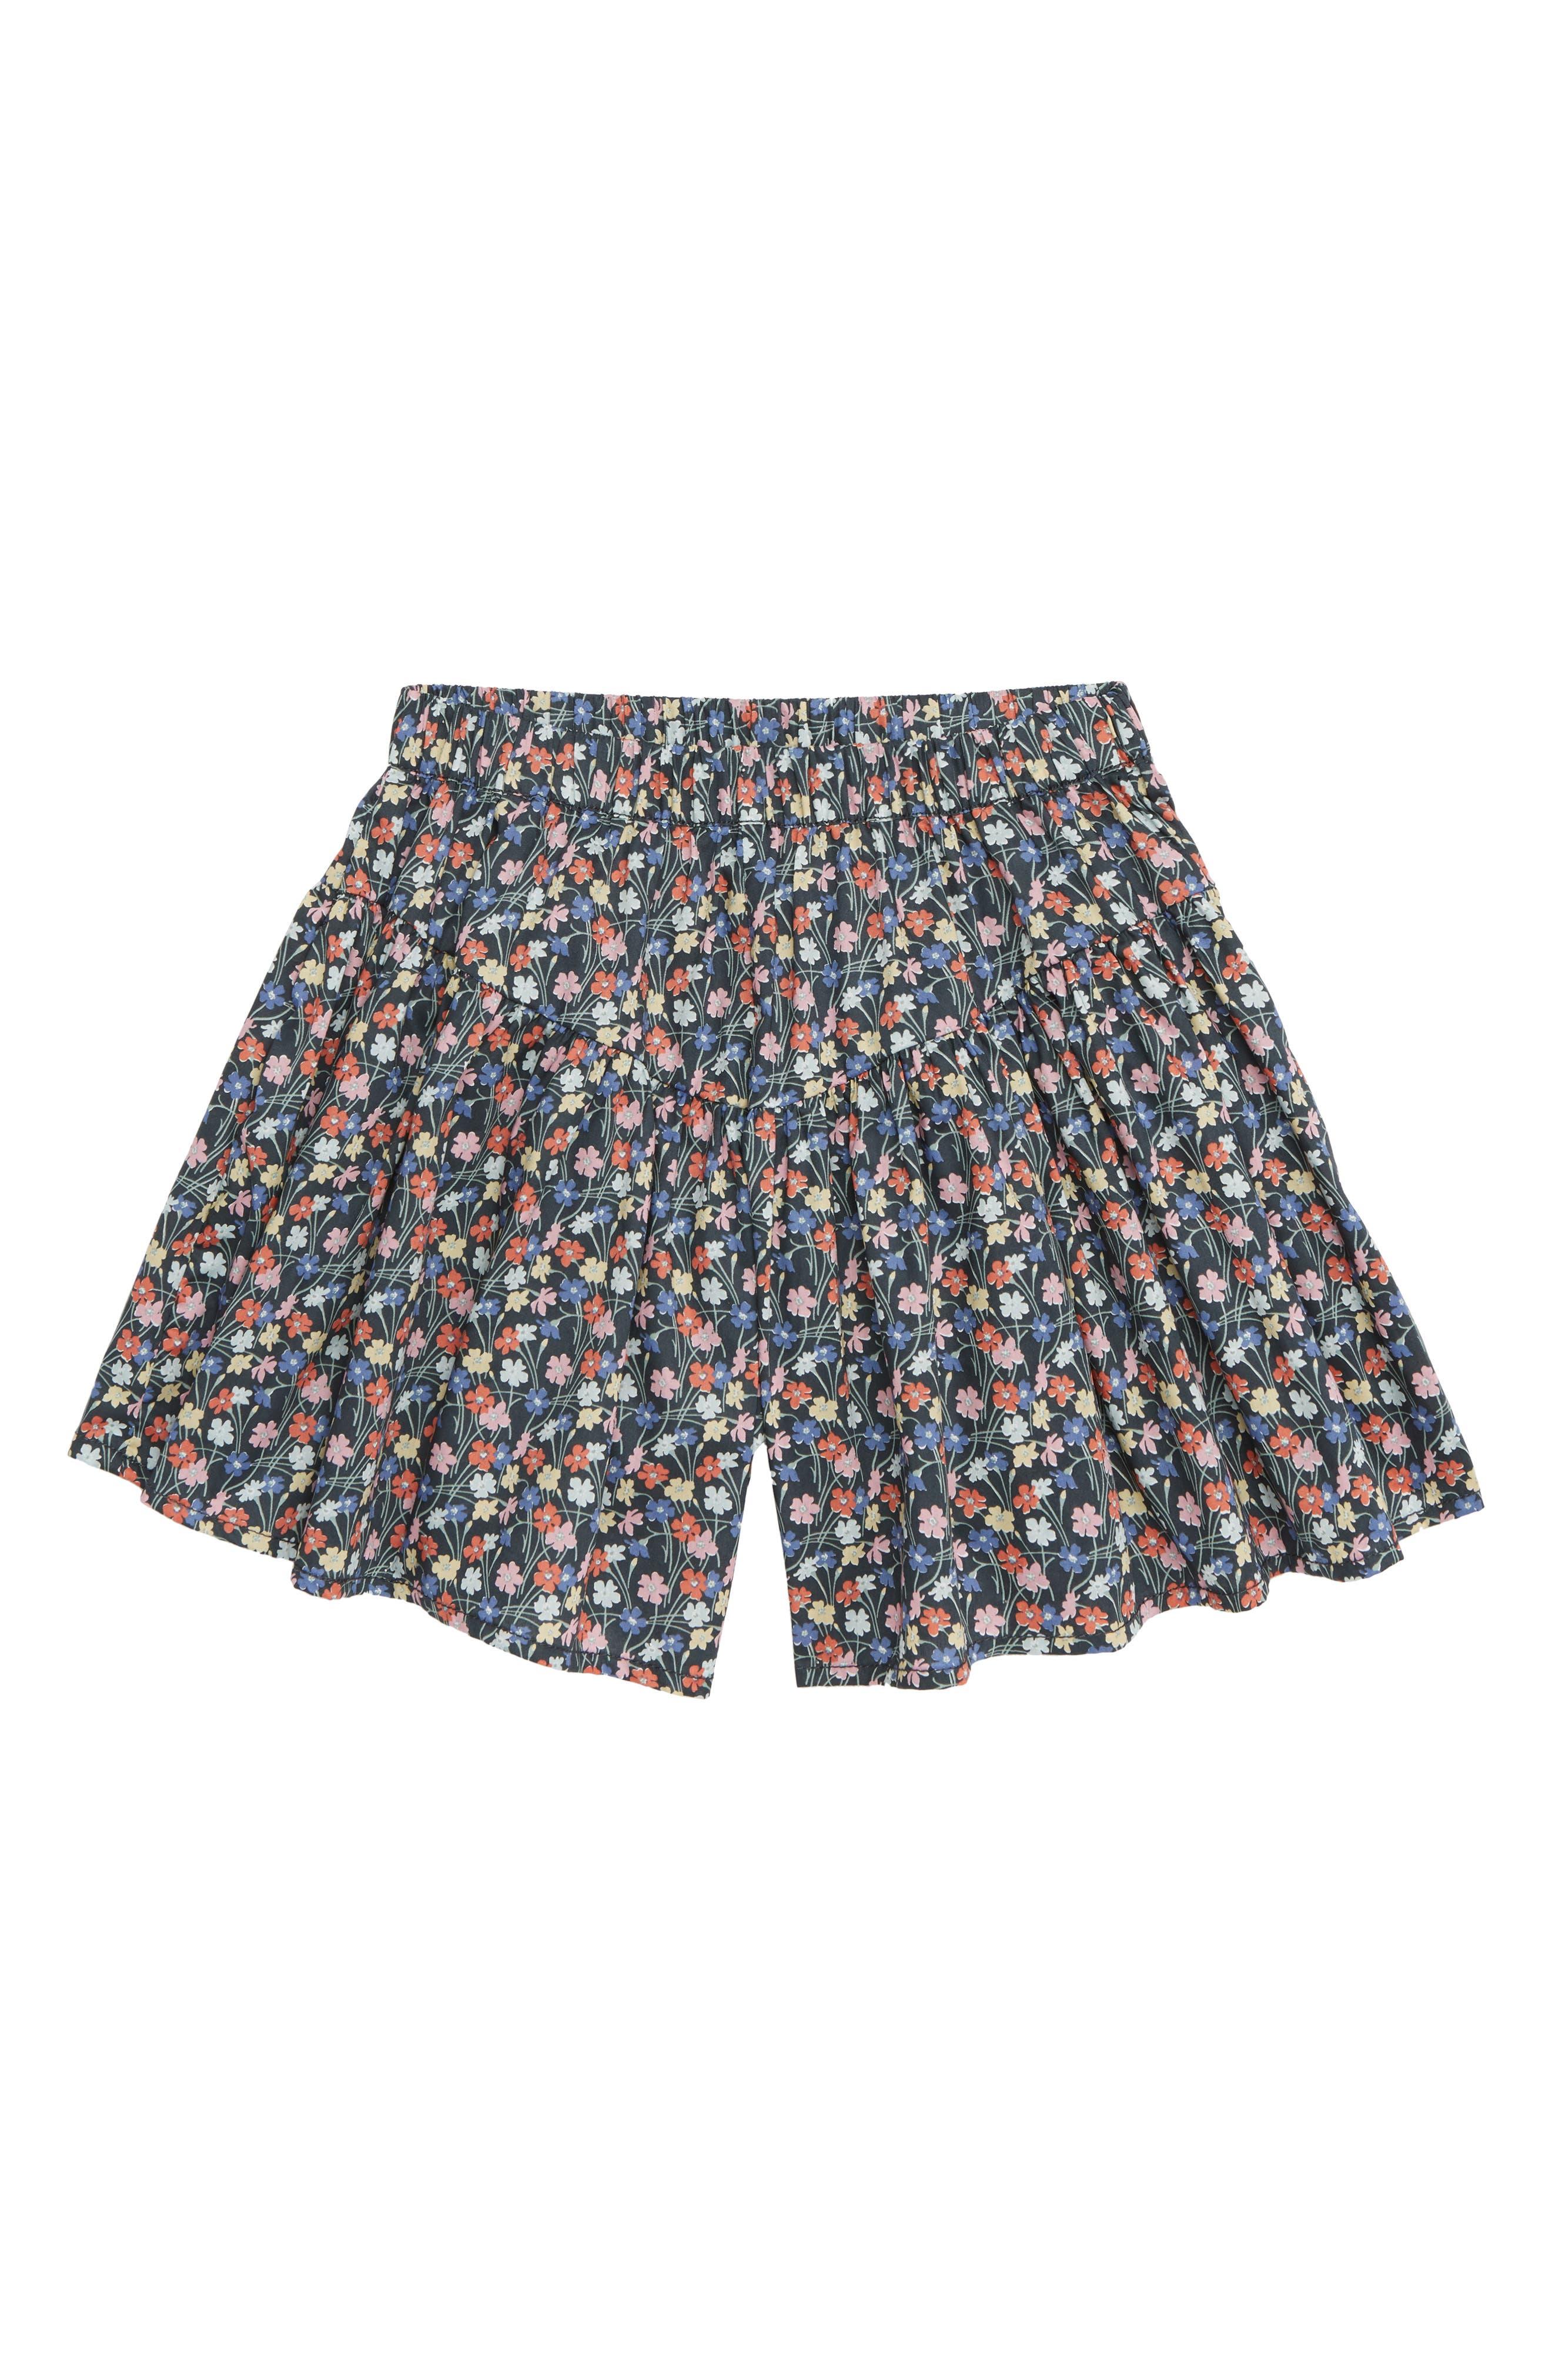 Alexa Shorts,                         Main,                         color, 020